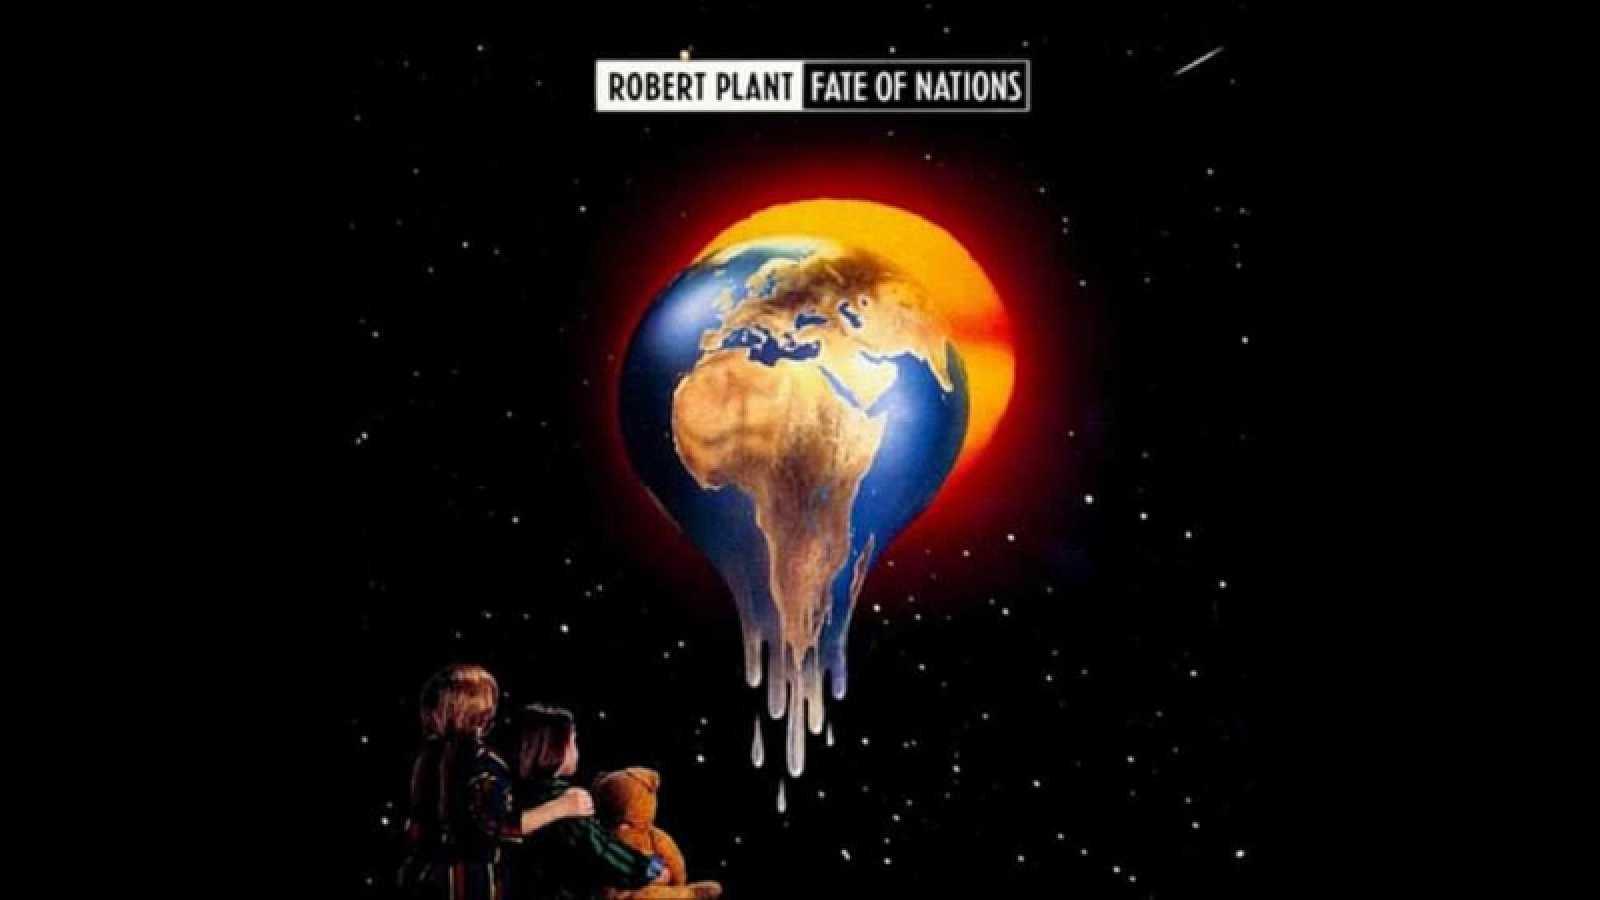 Próxima parada - Steven Wilson, Robert Plant y John Martin - 12/04/21 - escuchar ahora